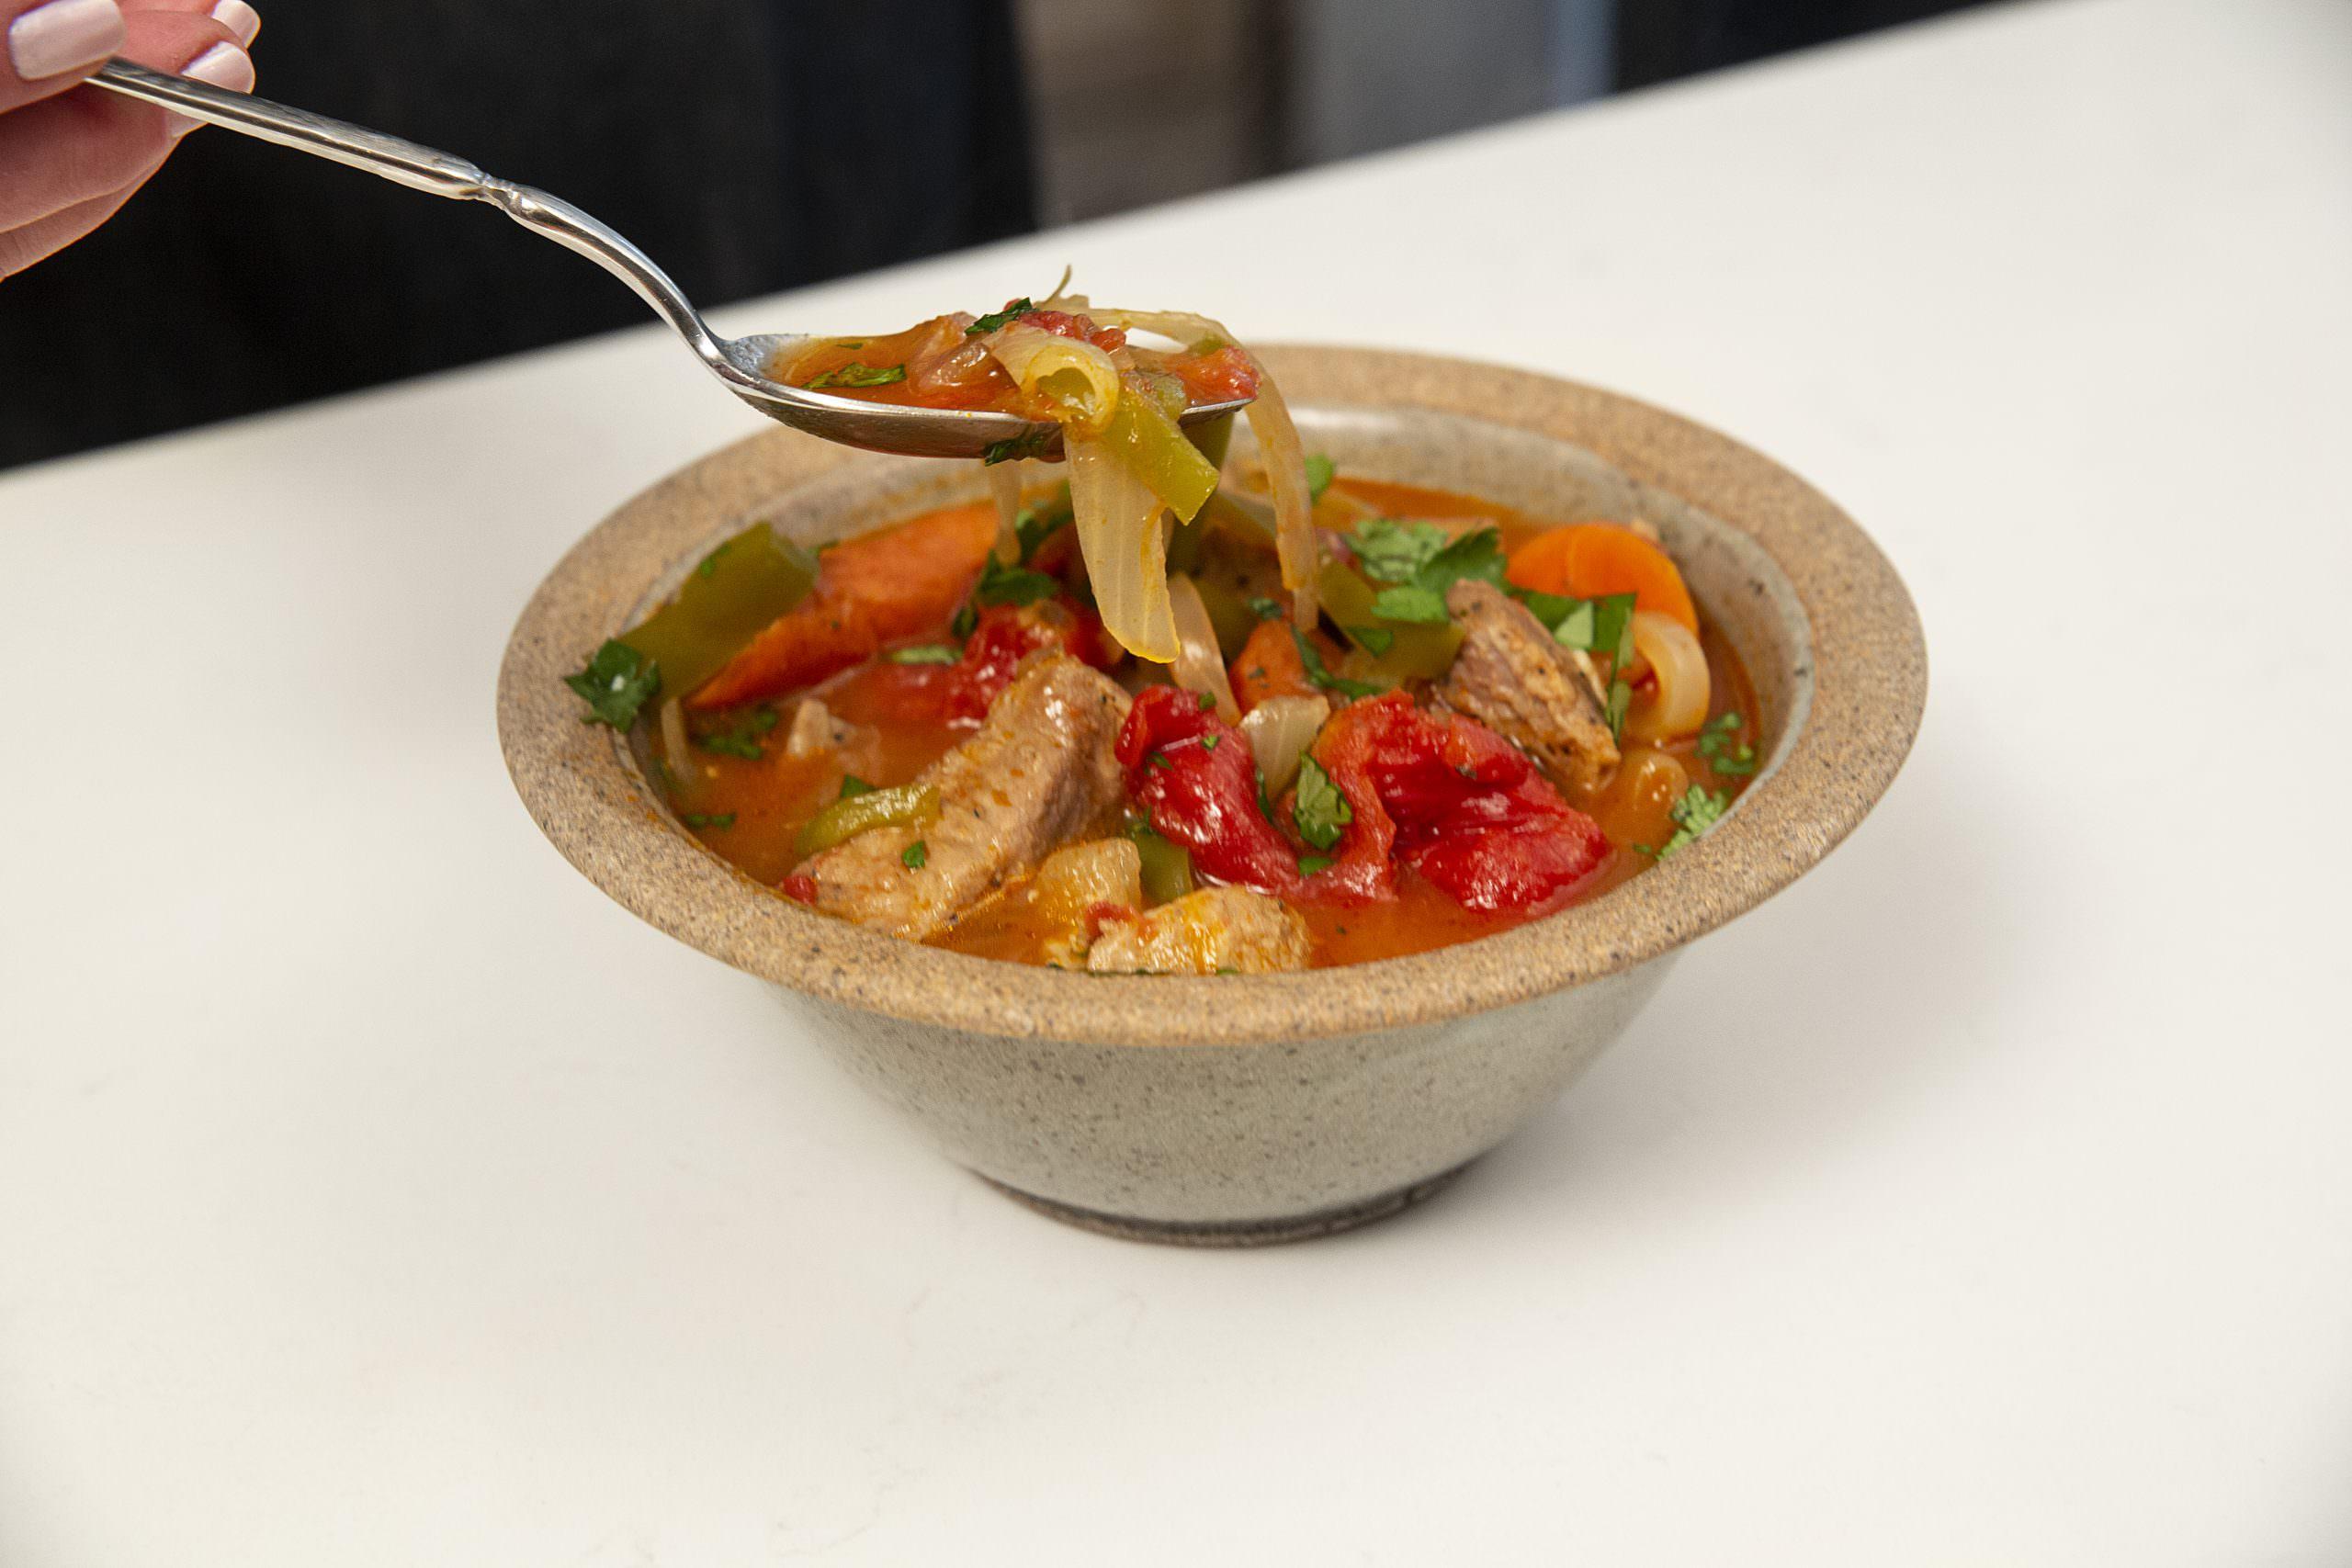 Bowl of Spicy Pork Stew